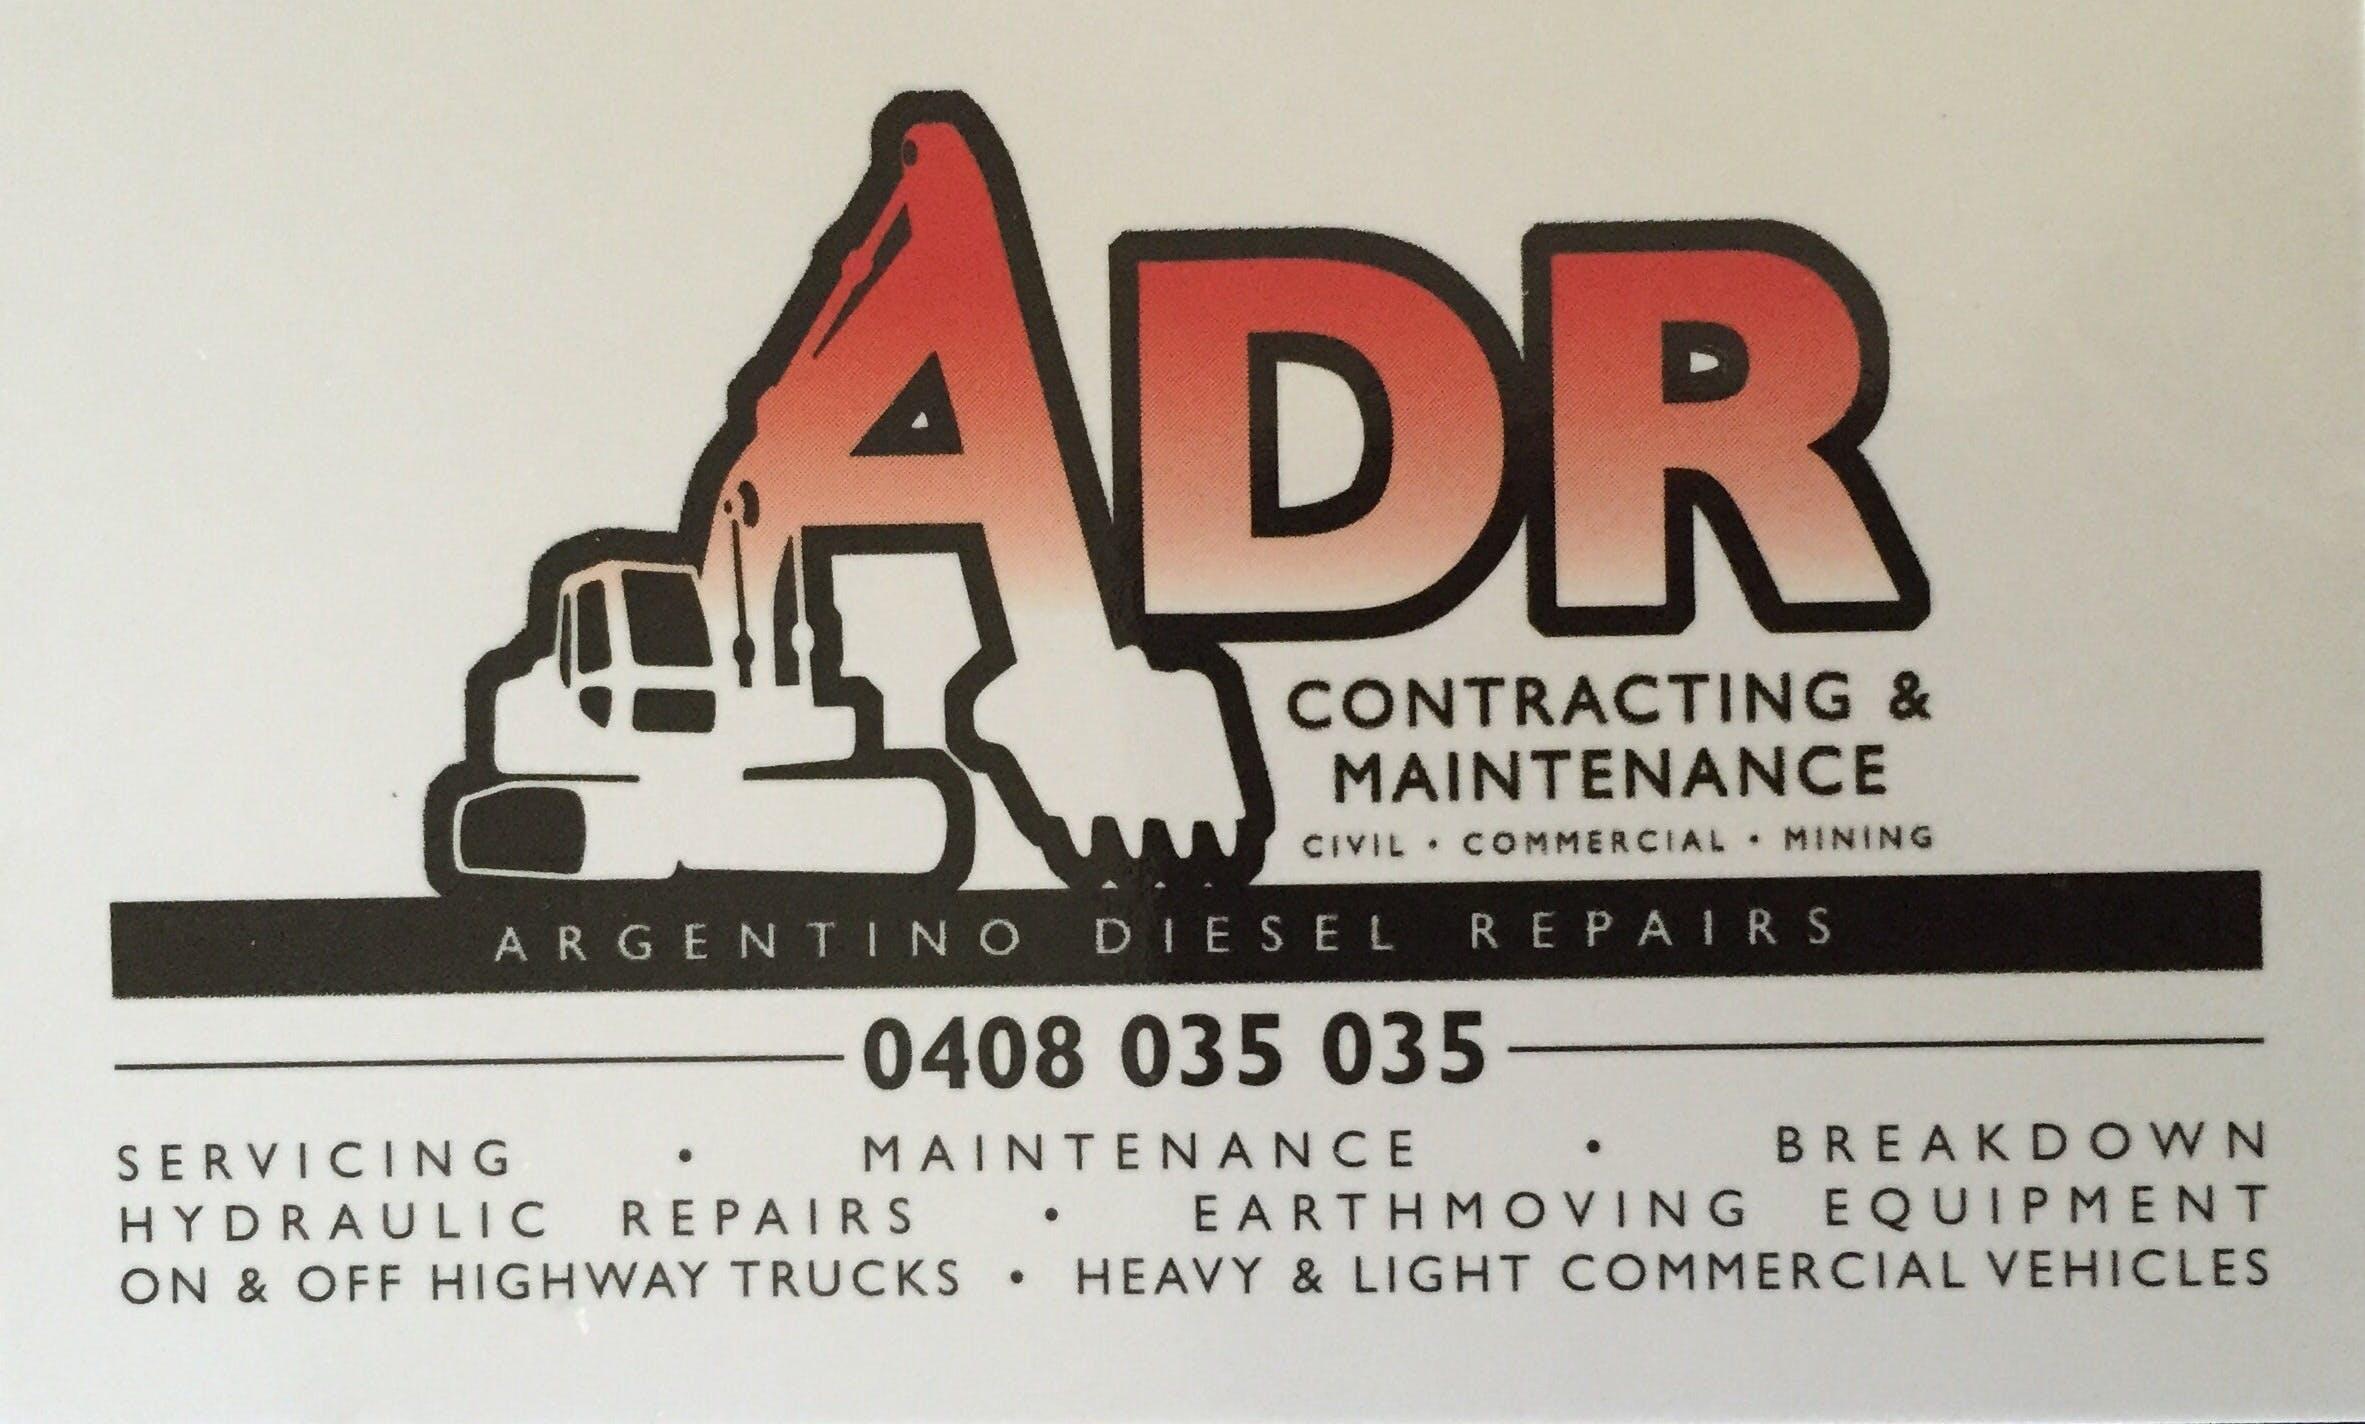 Argentino Diesel Repairs, Contracting & Maintenance